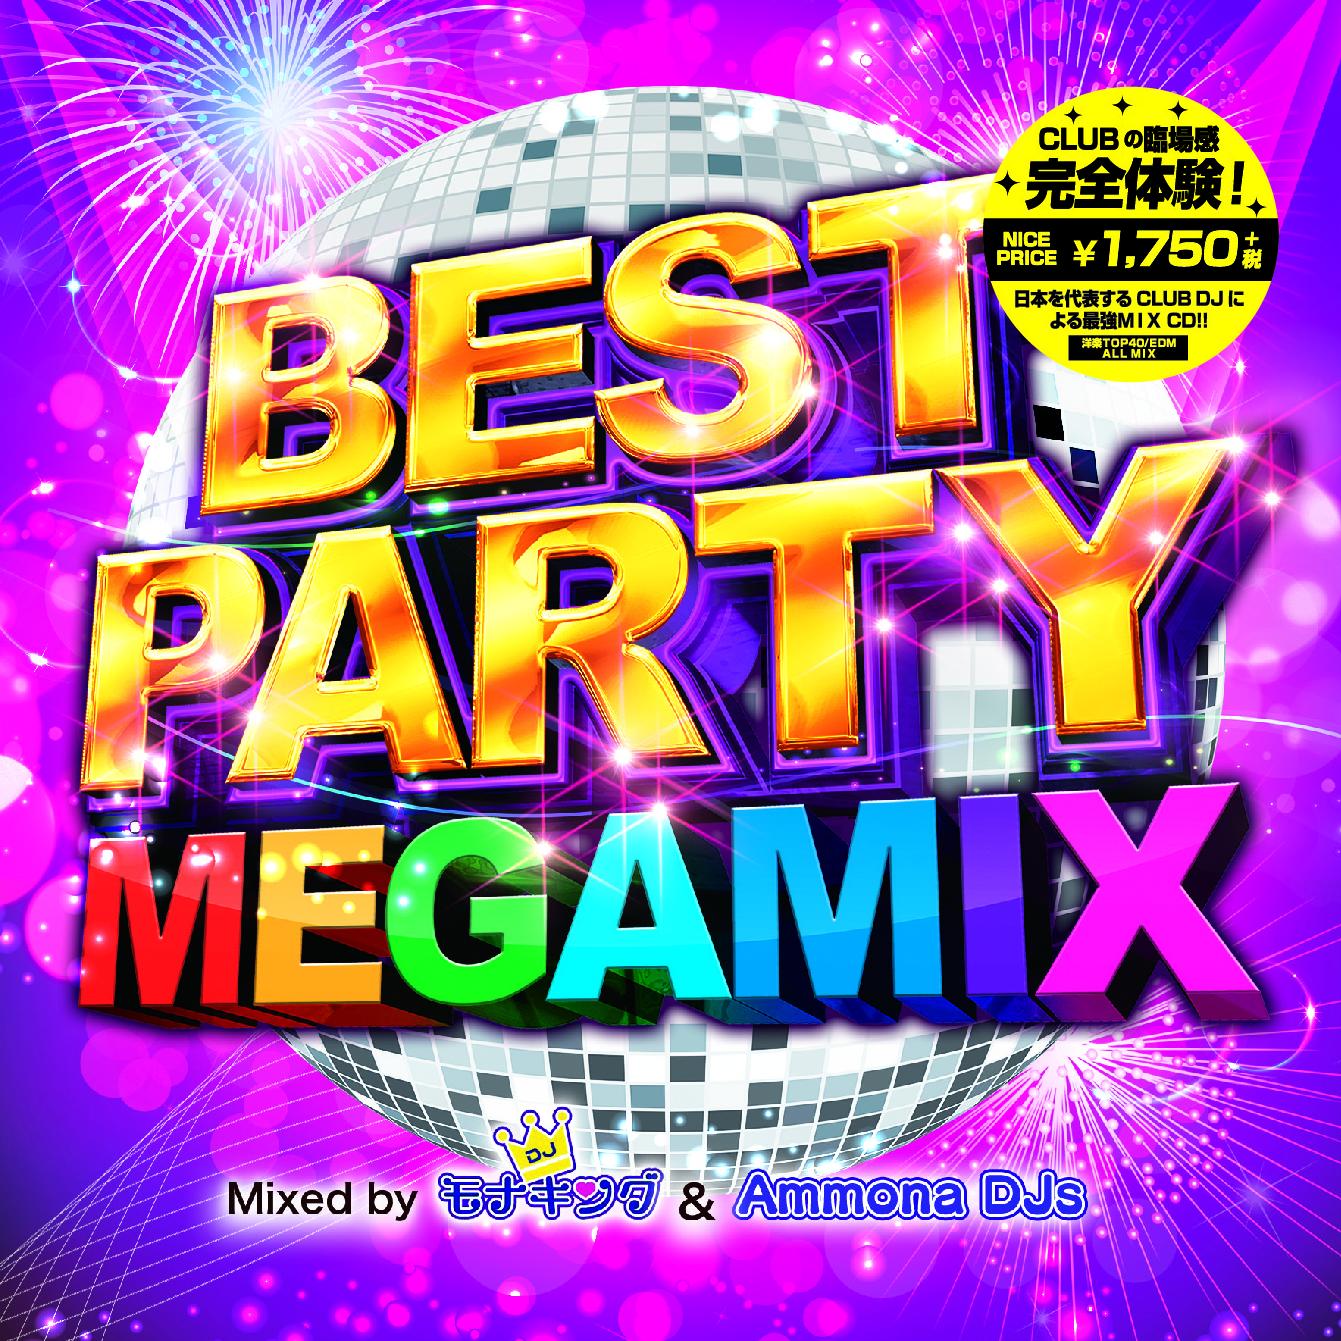 「BEST PARTY MEGAMIX」がiTunesランキング2位を獲得!